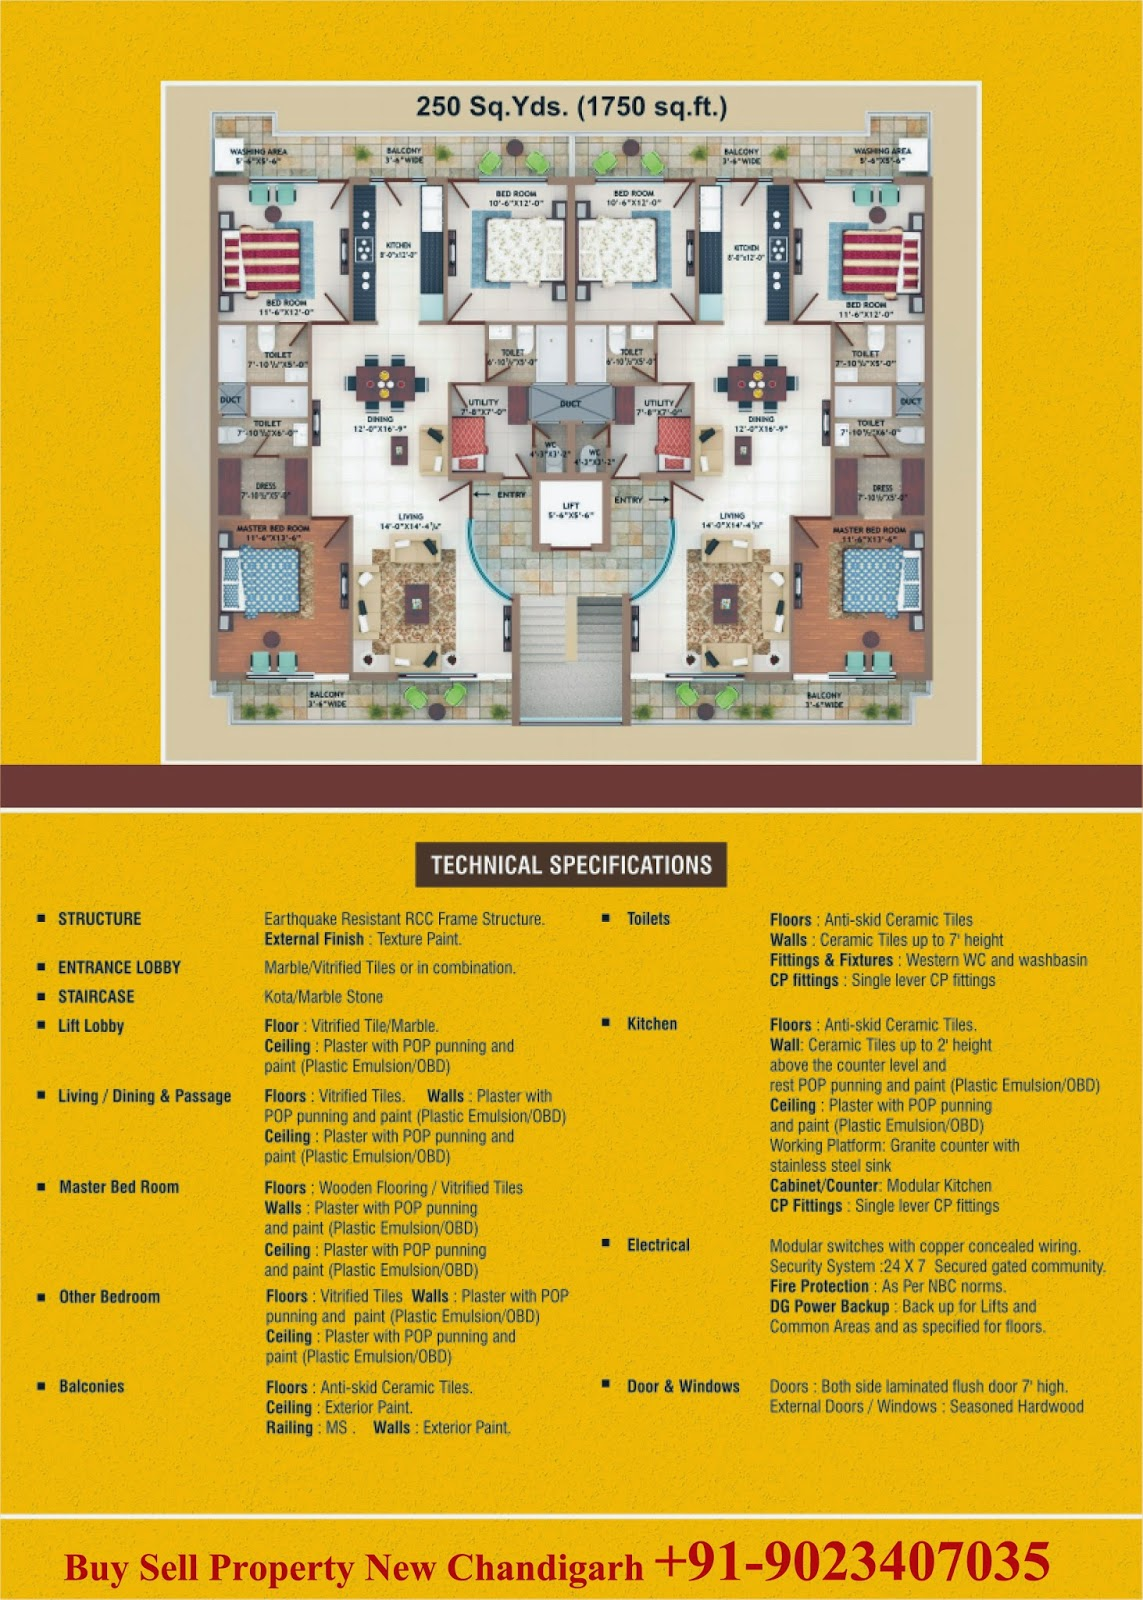 Park Terraces Floors at suntec city Mullanpur new chandigarh, Modern Living Welare Society